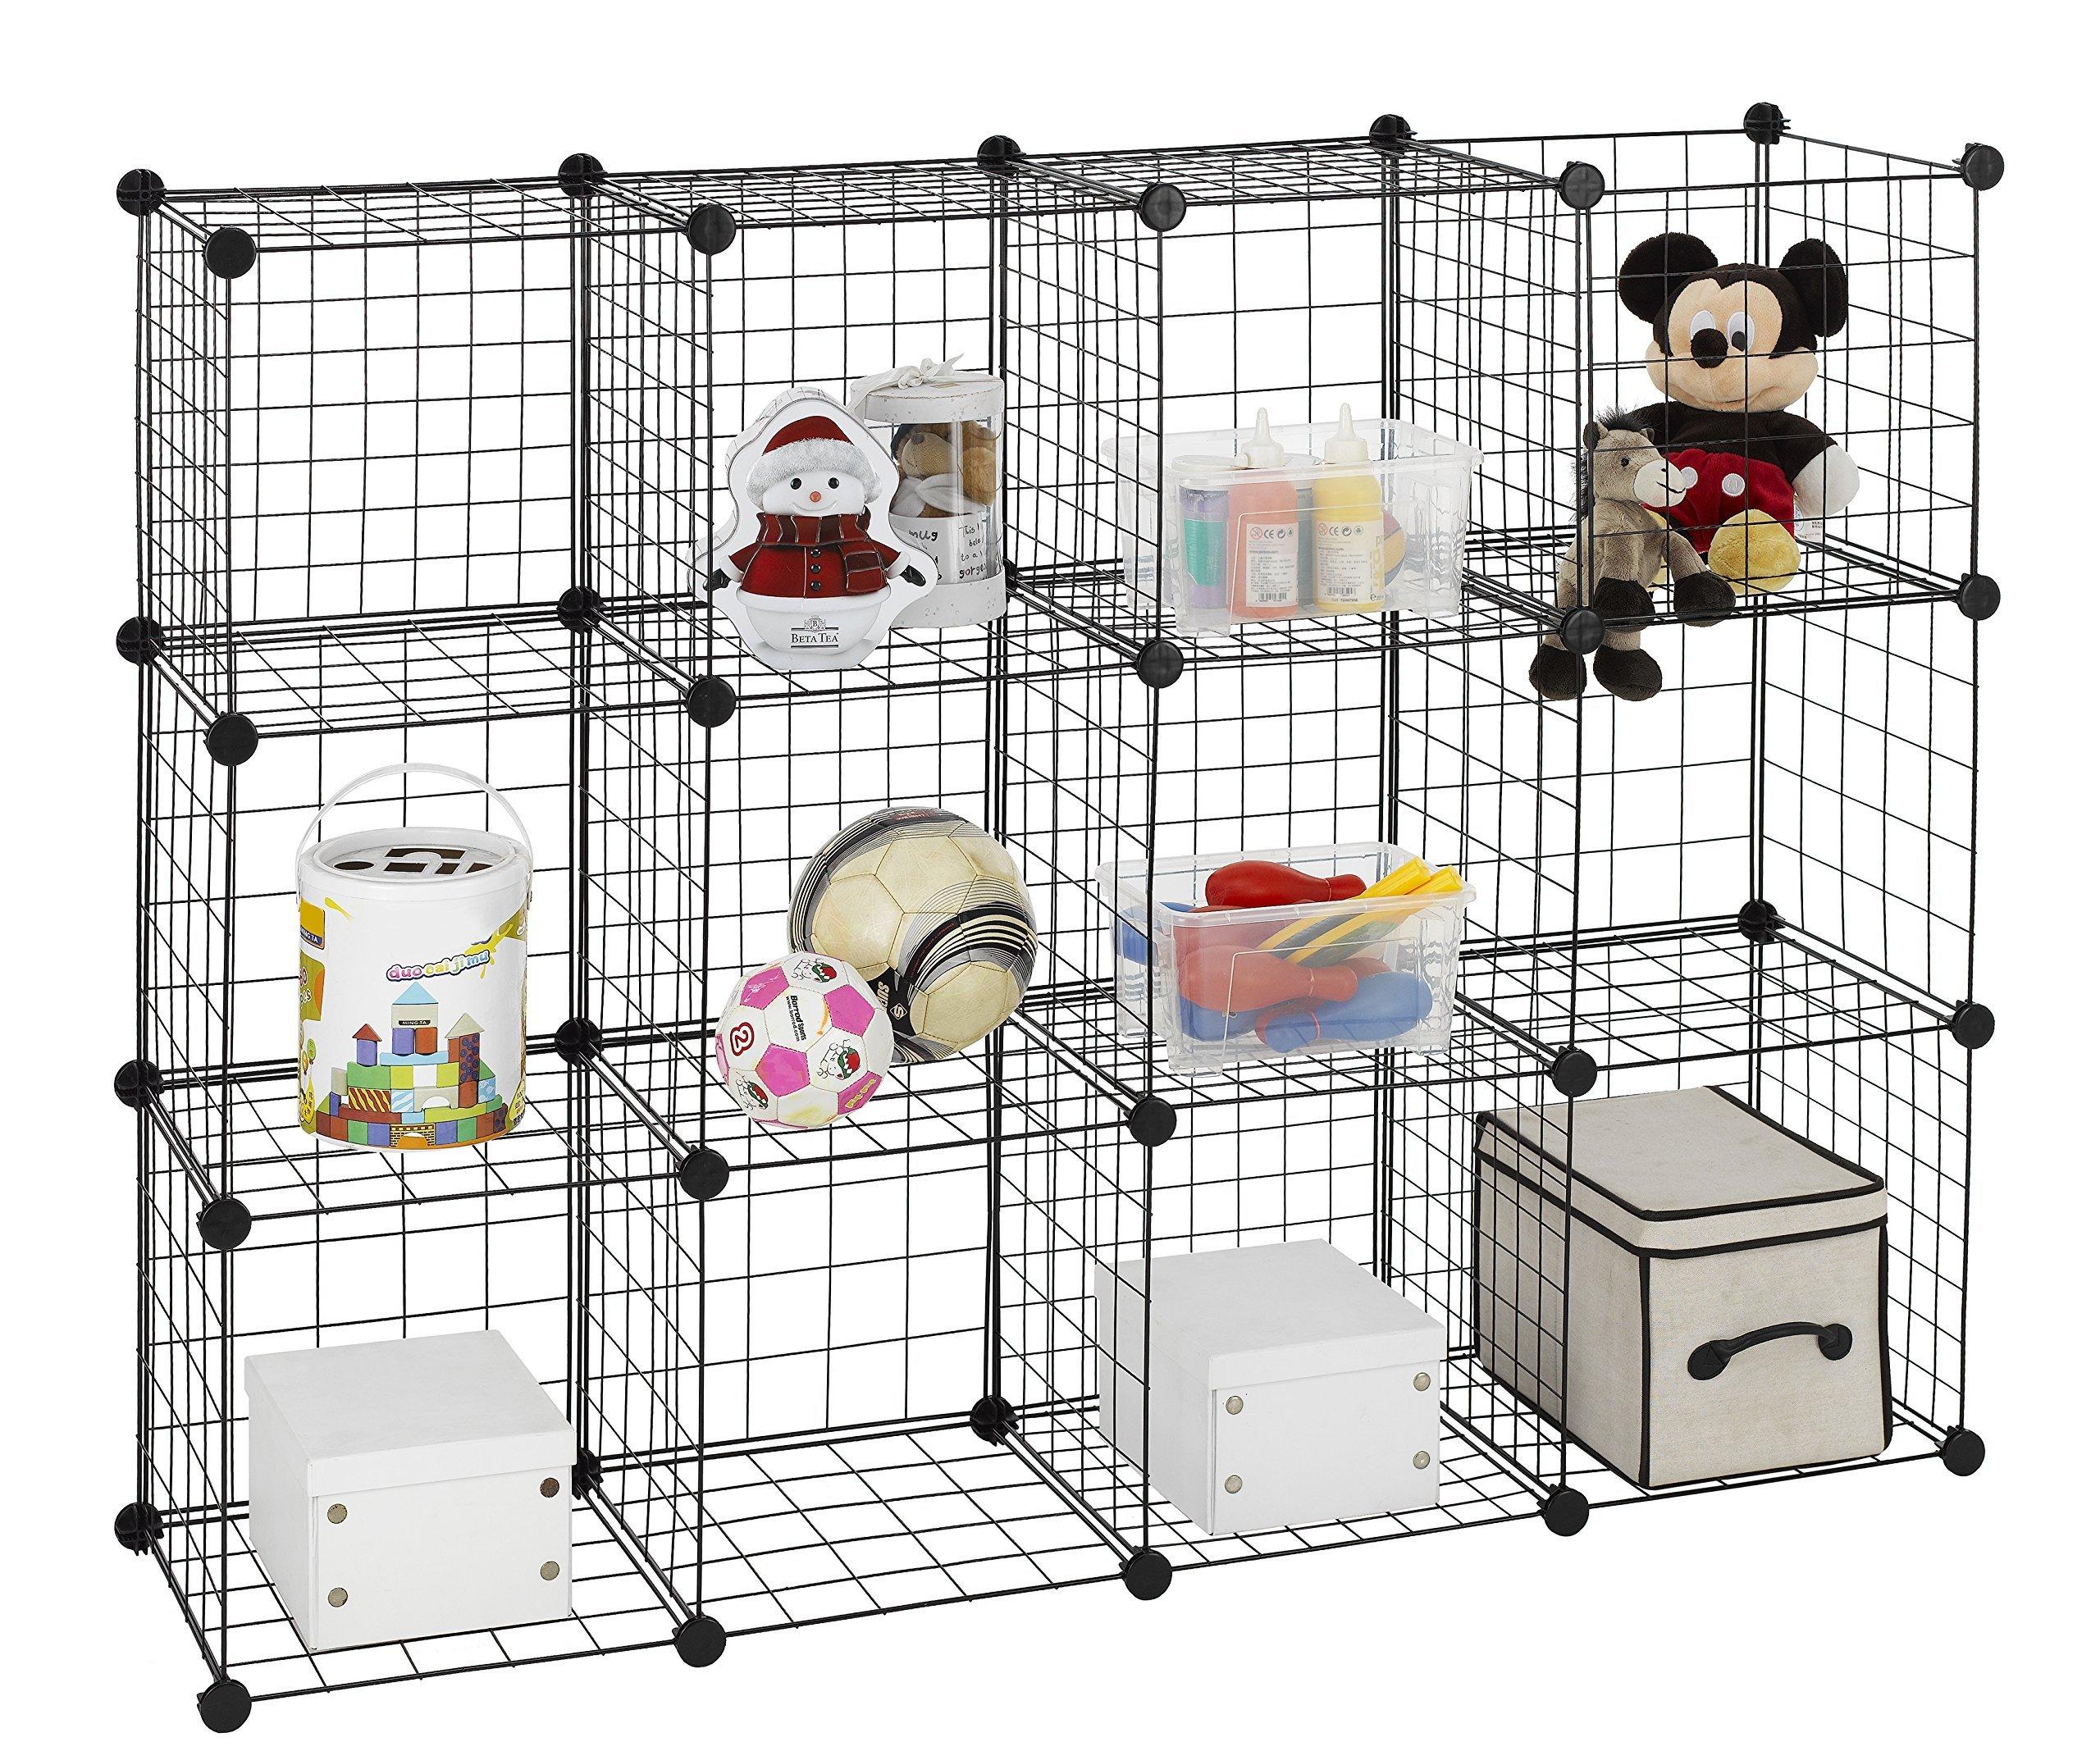 Finnhomy 12 Storage Cubes Multi Use DIY Wire Grid Organizer Closet Organizer Shelf Cabinet Wire Grids Panels Garage Storage Rack Sets Shelving Units for Books/Plants/Toys/Shoes/Clothes Black